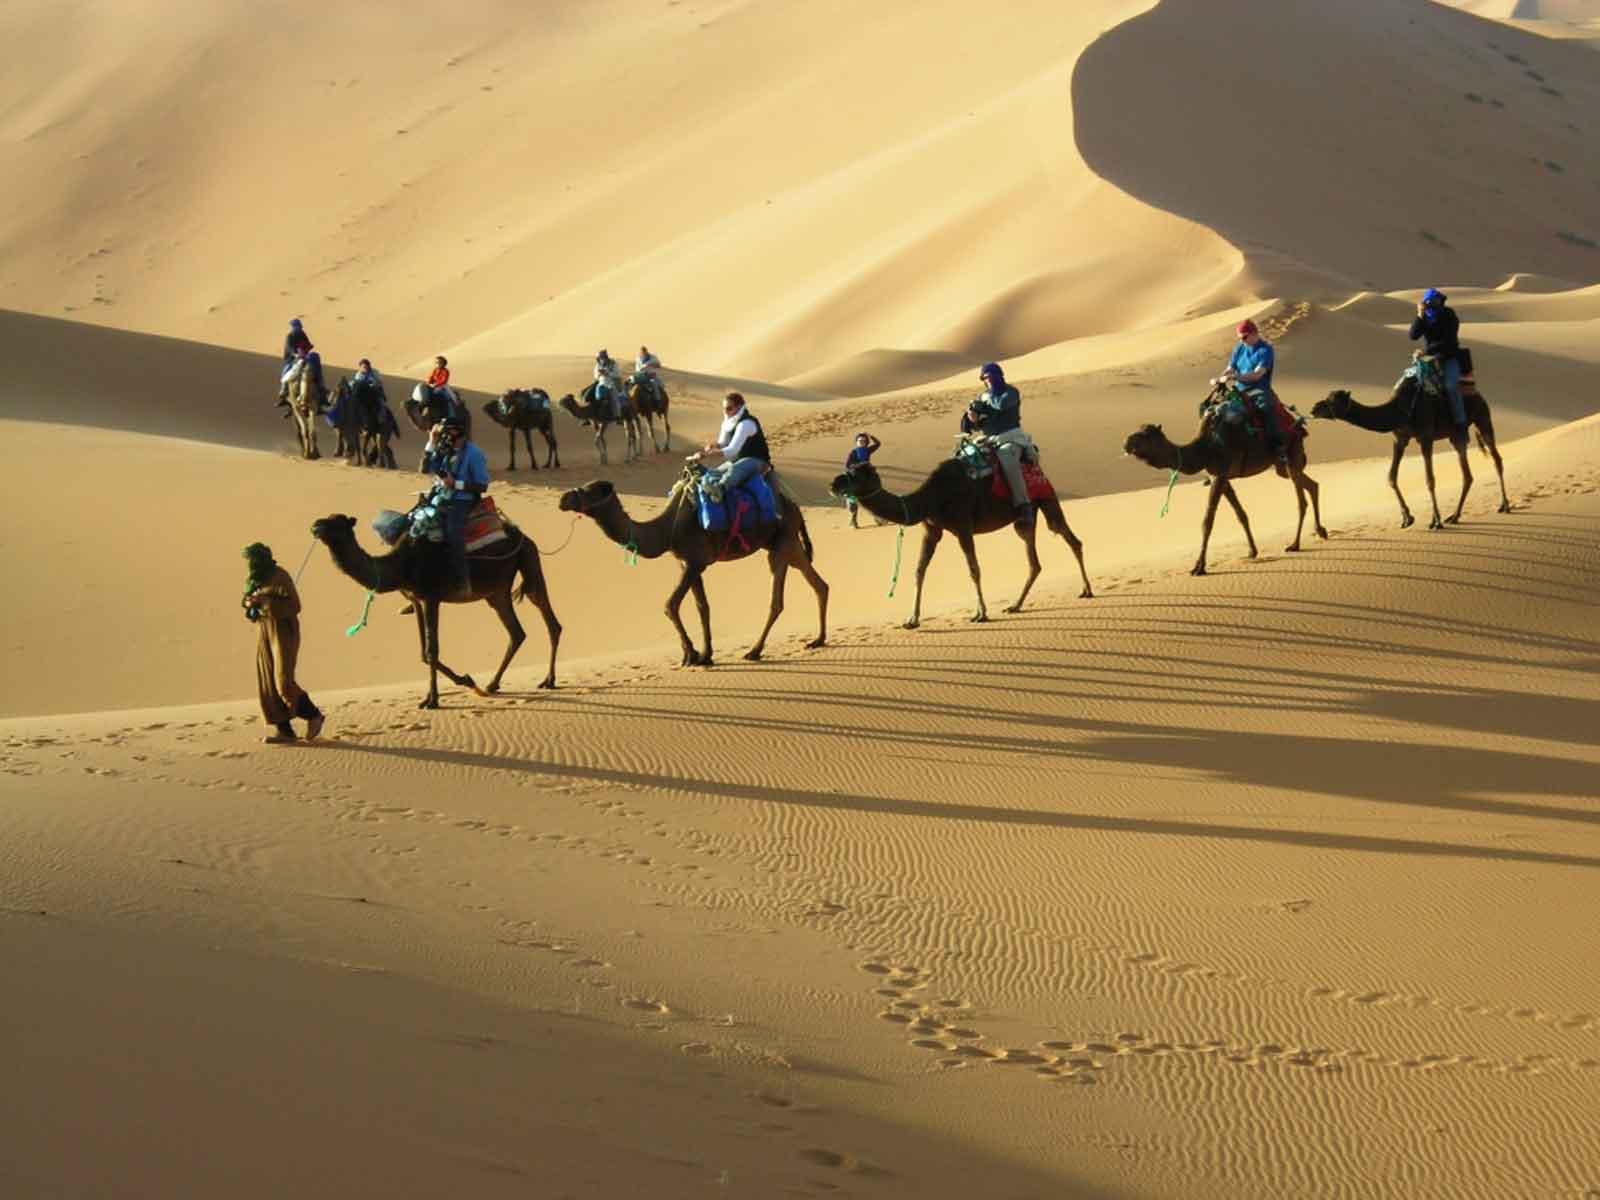 Fes to Marrakech desert tour